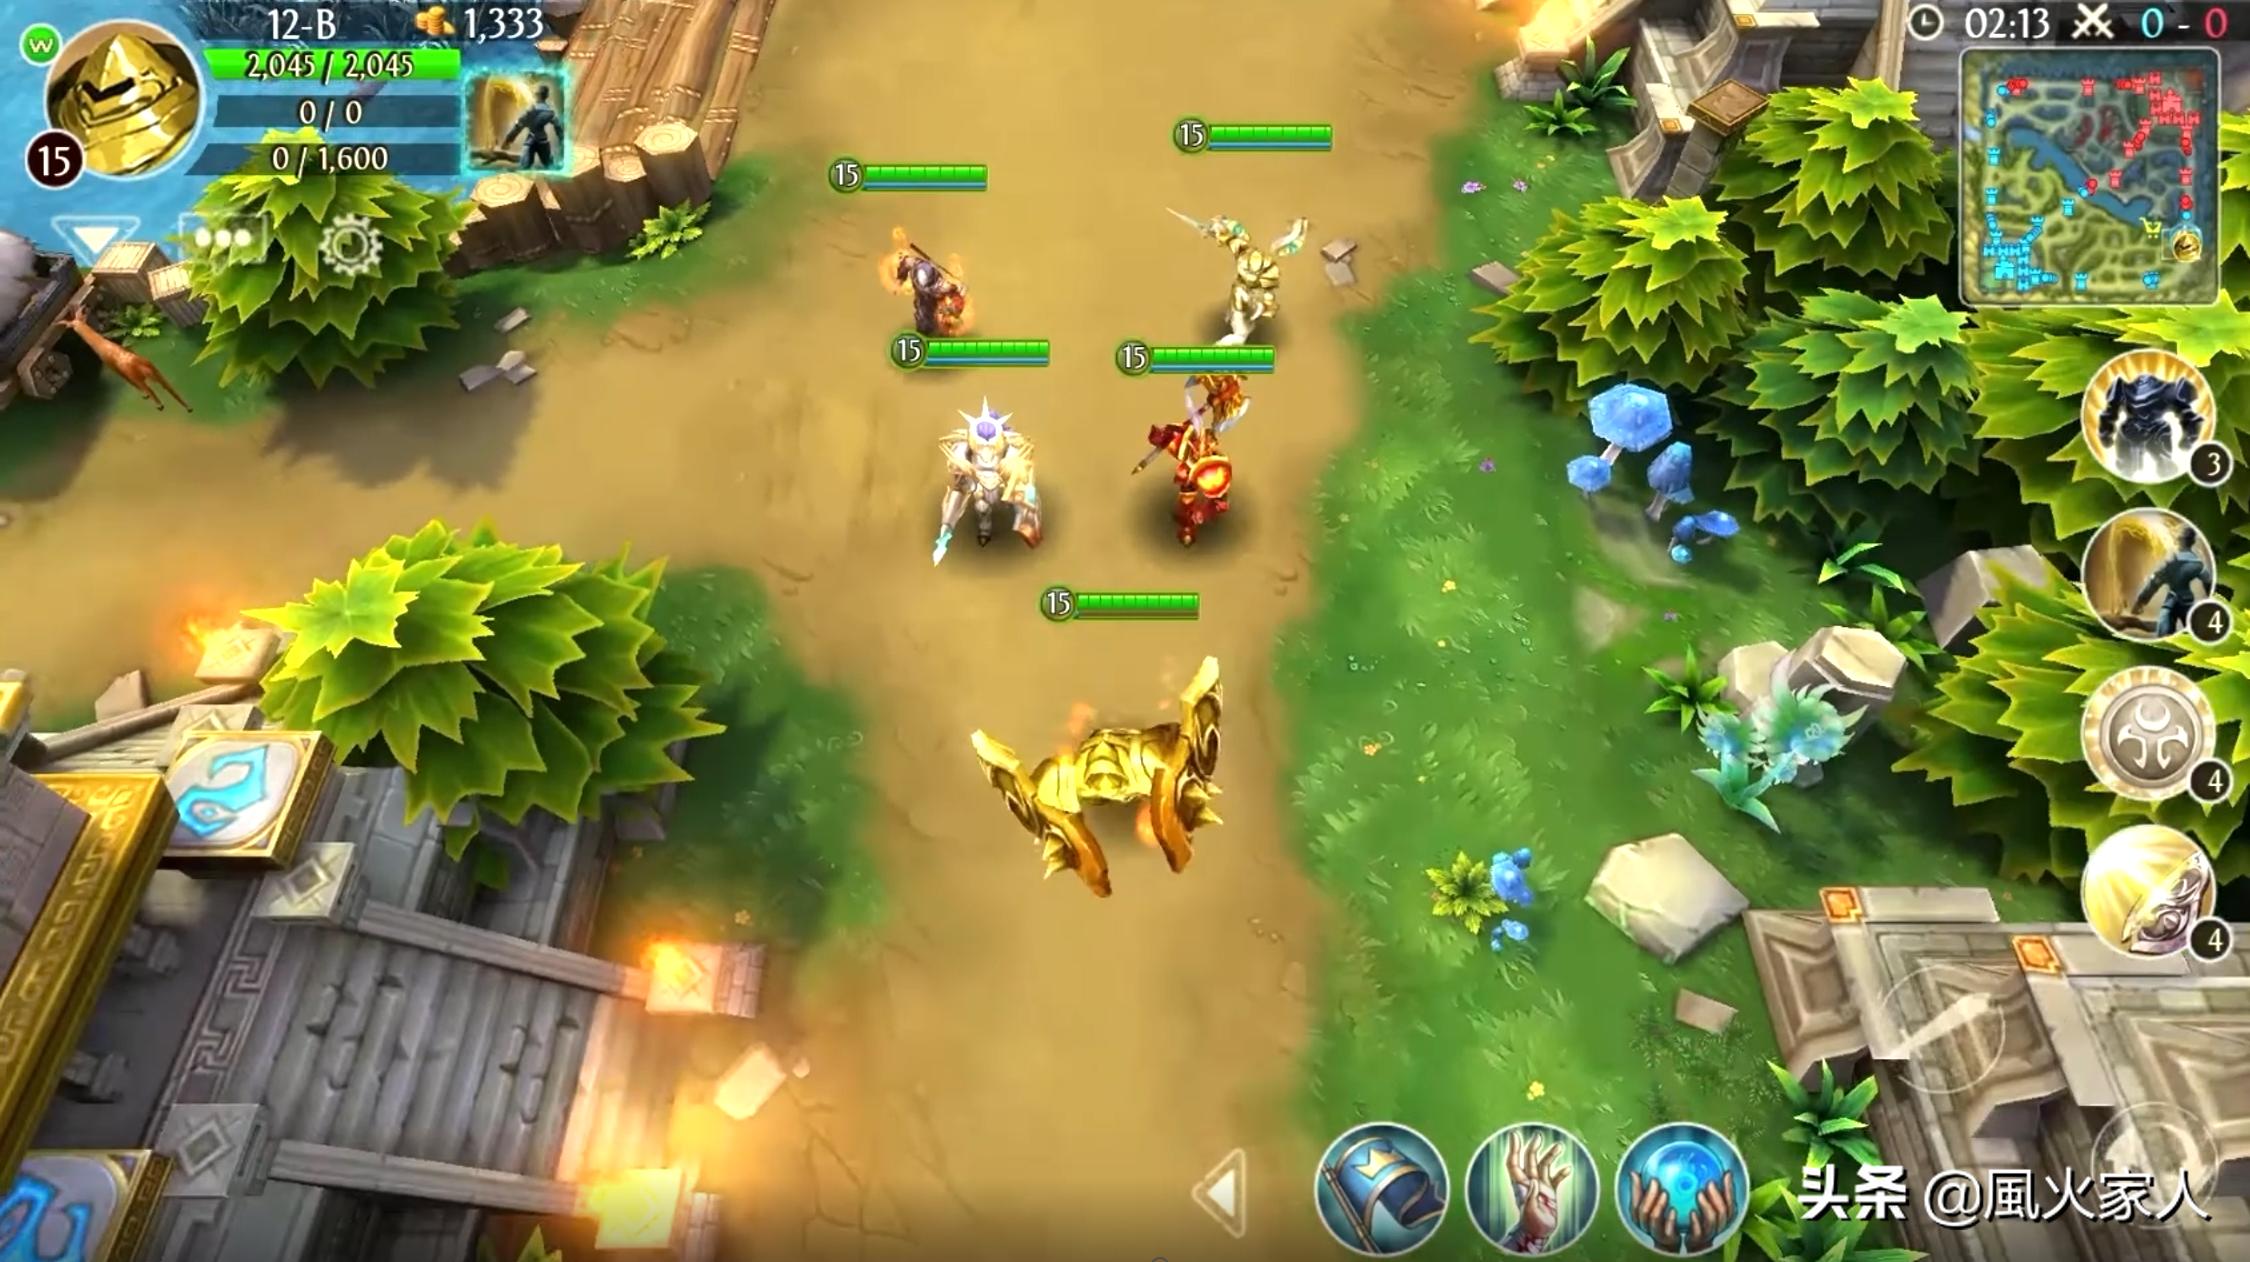 MOBA手游传奇-《混沌与秩序-英雄战歌》的游戏介绍